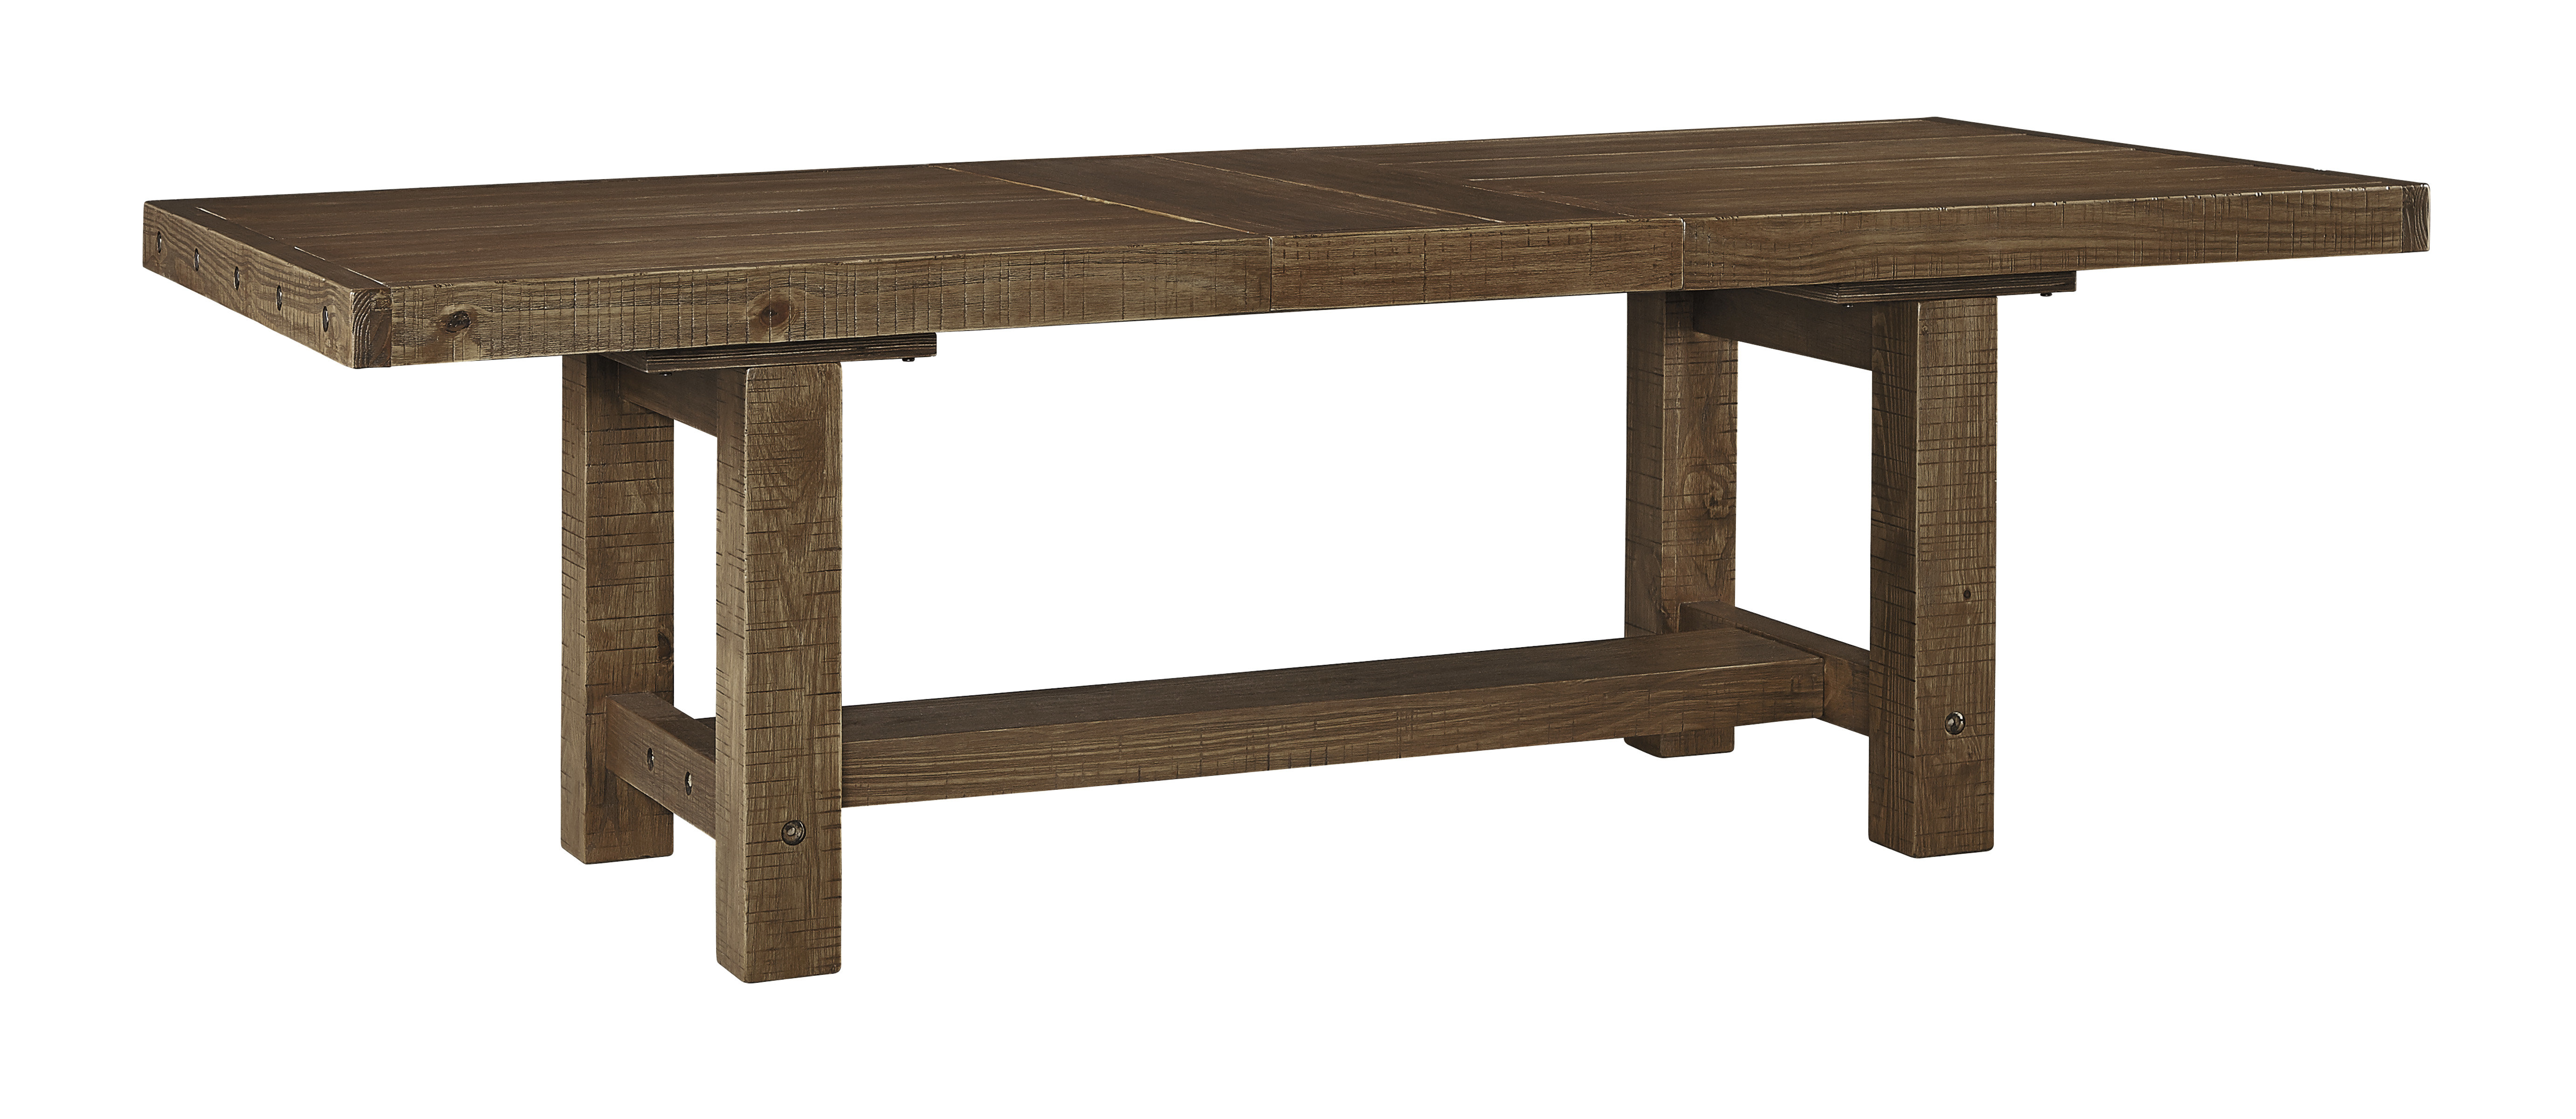 loon peak etolin extendable dining table & reviews |  Wayfair YBDTXFU